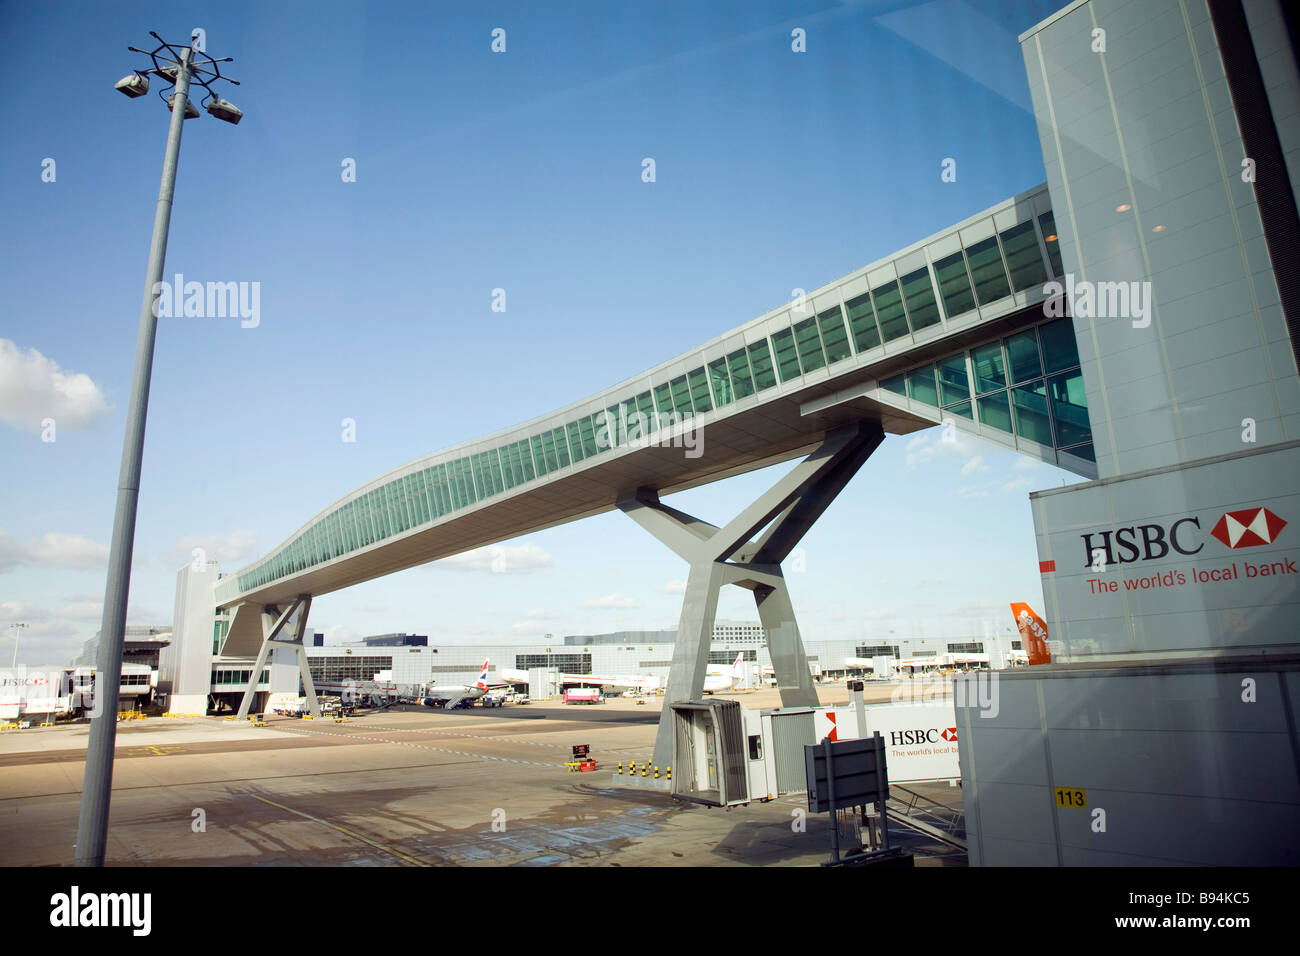 London Gatwick Airport passenger footbridge. - Stock Image